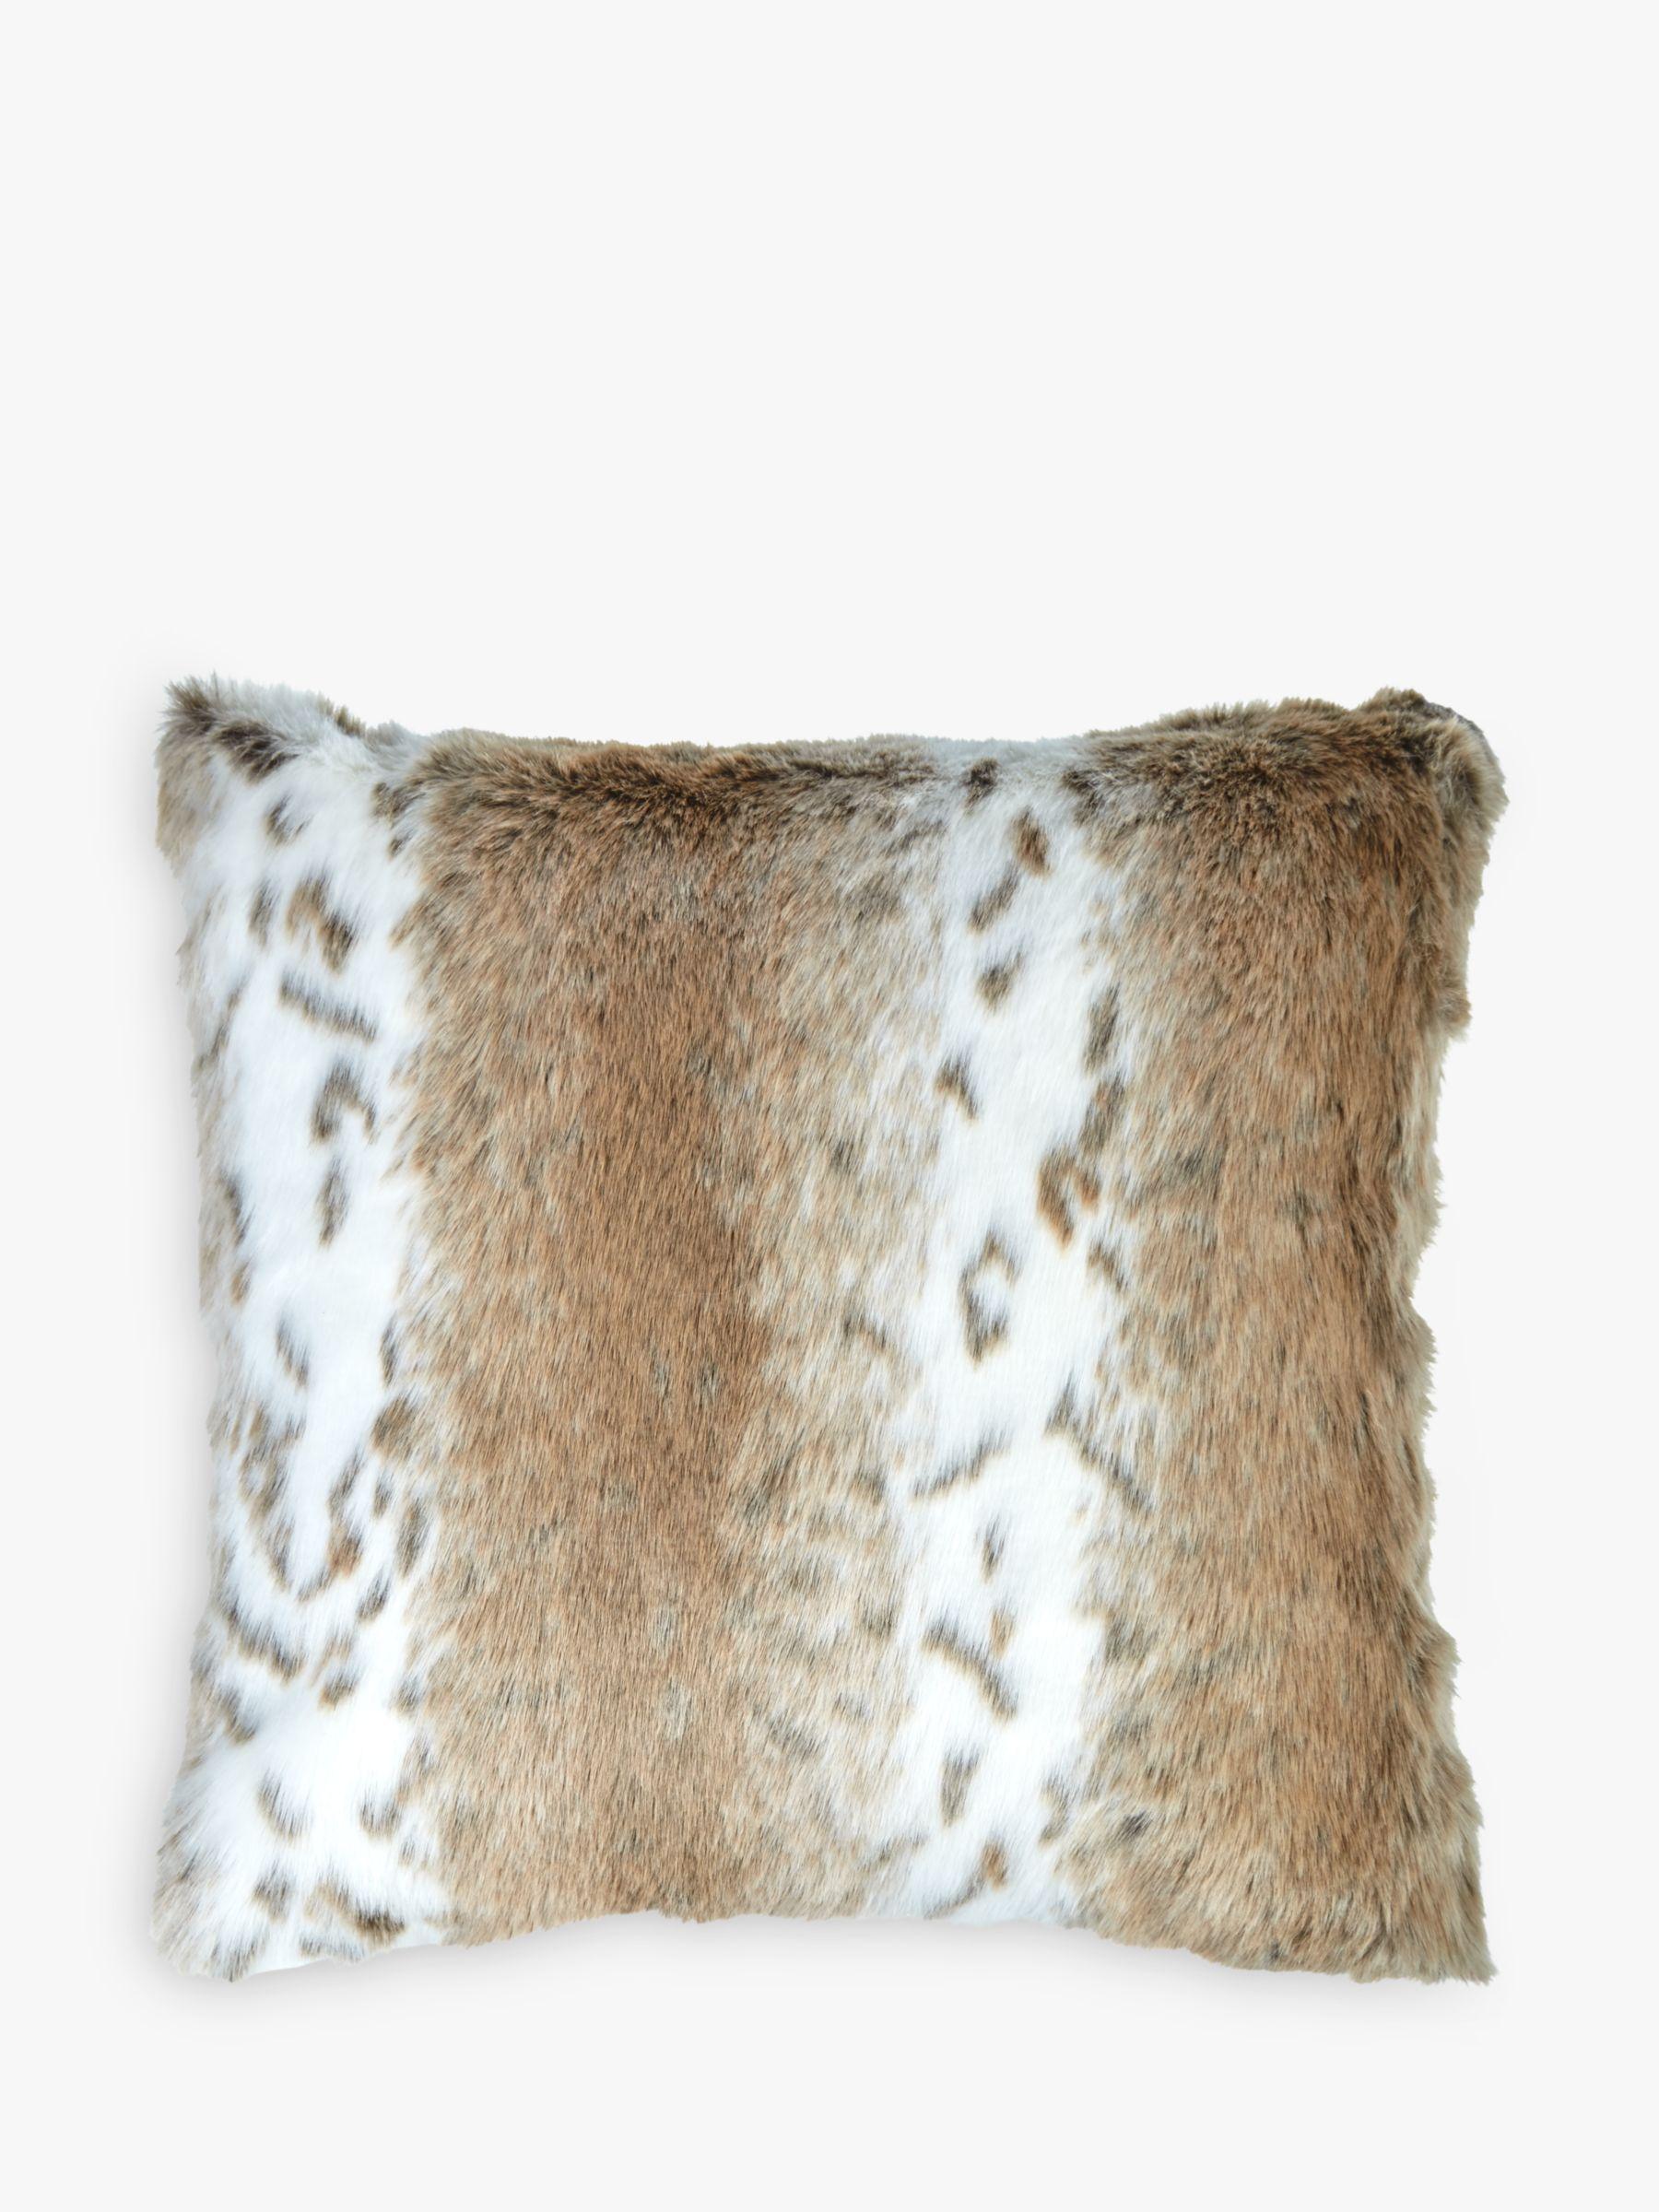 Helene Berman Helene Berman Cream Spot Faux Fur Cushion